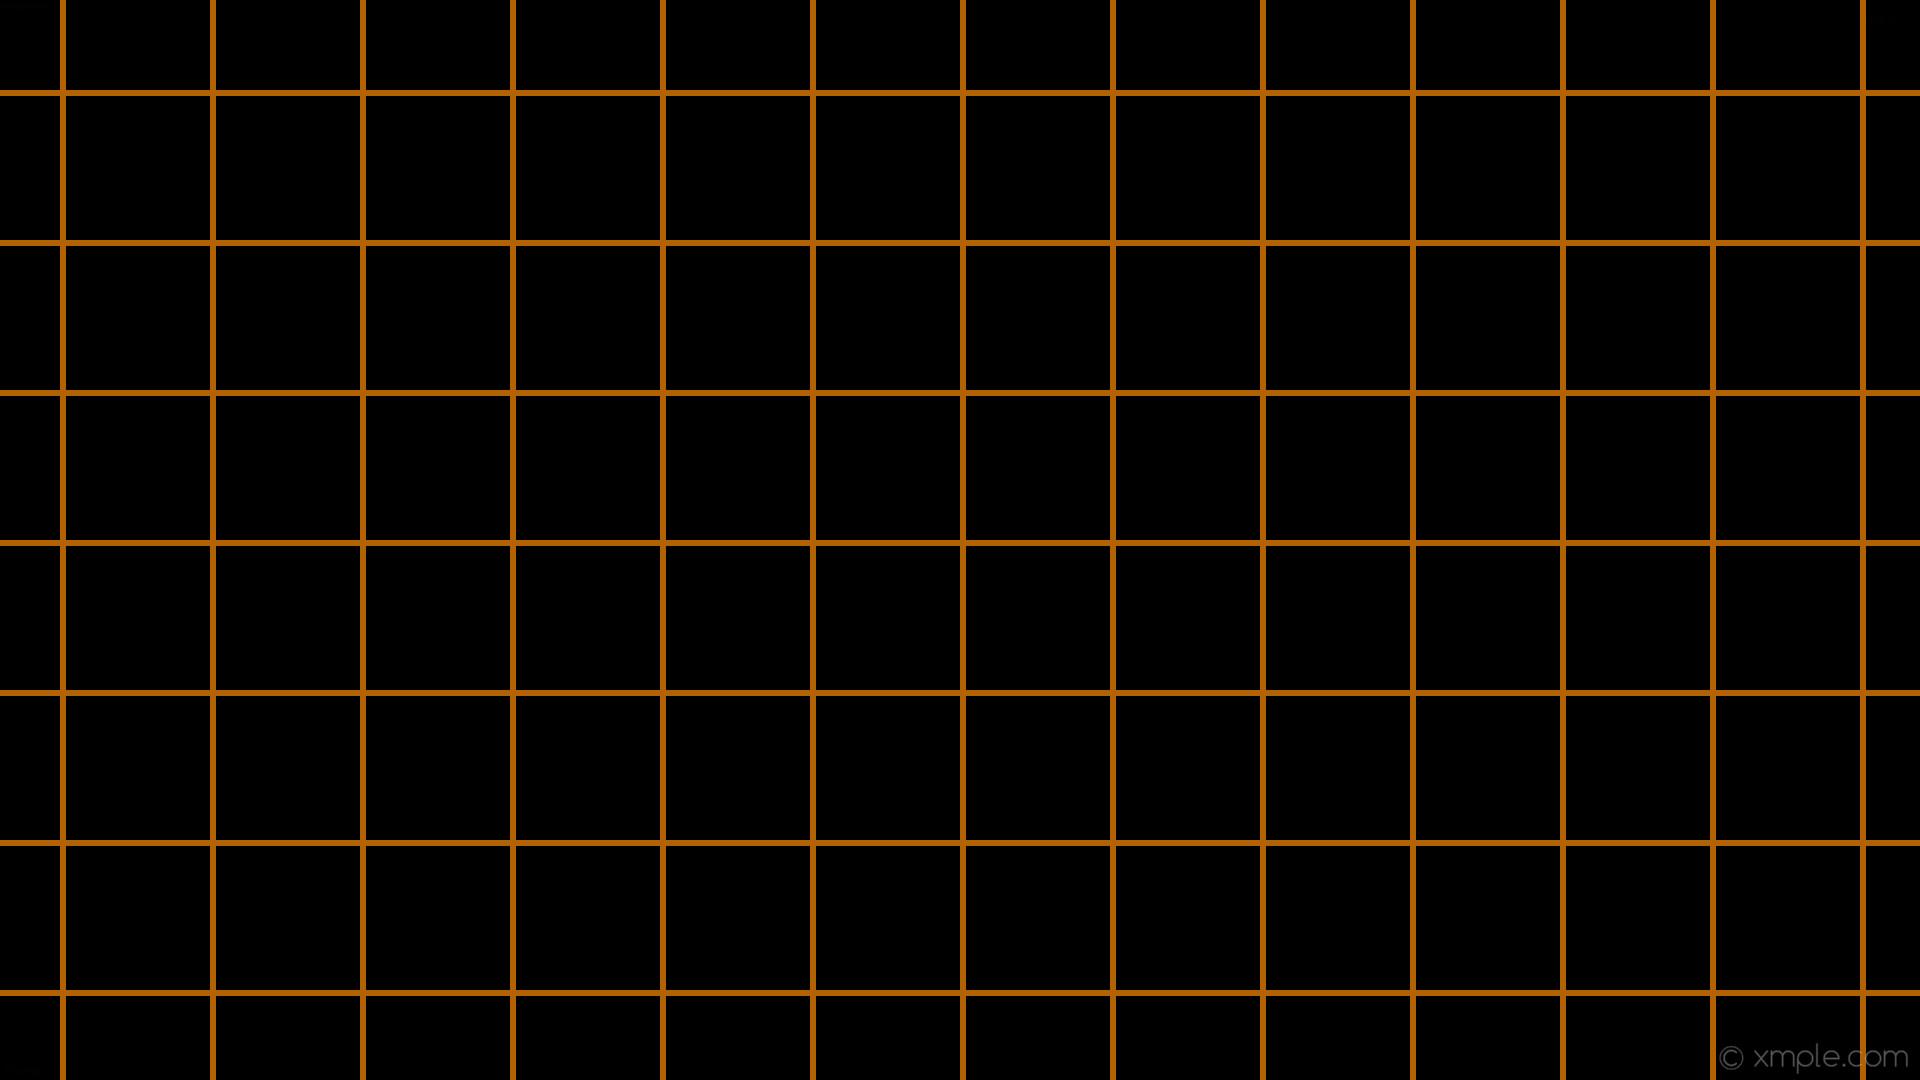 wallpaper graph paper orange black grid dark orange #000000 #ff8c00 0° 6px  150px